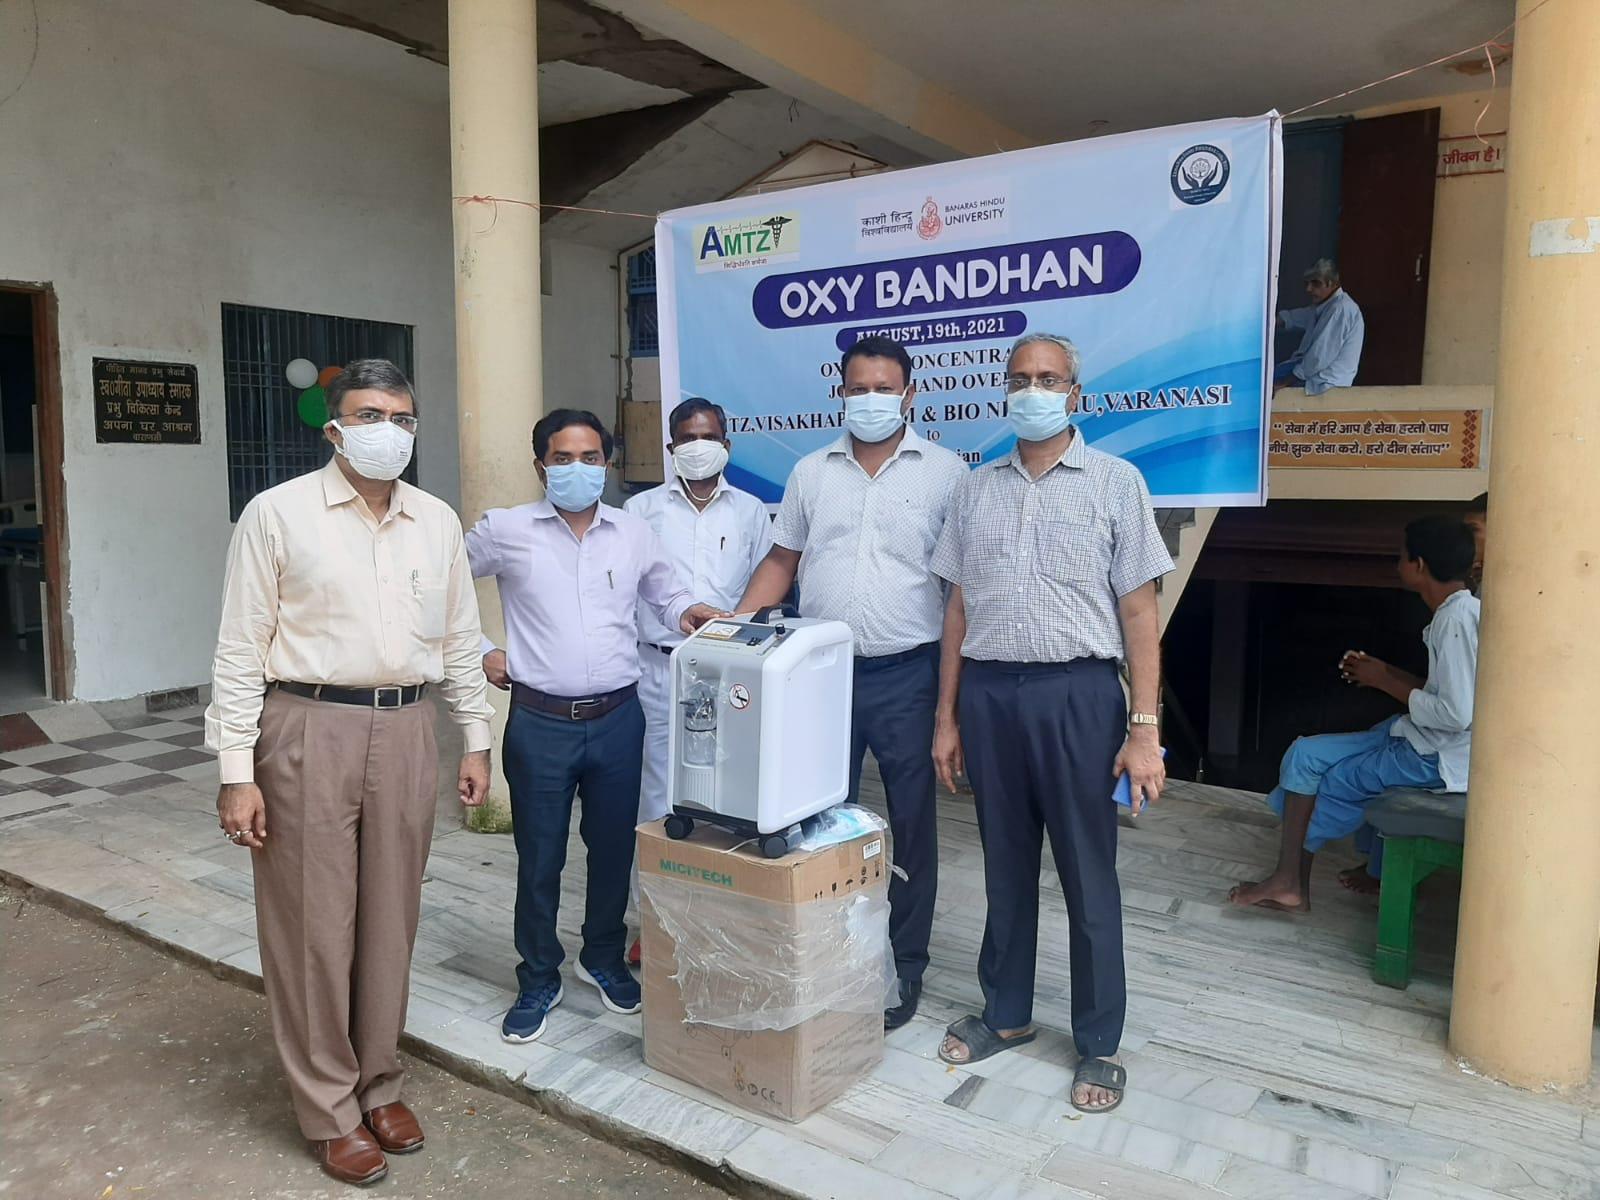 Oxy Bandhan 2